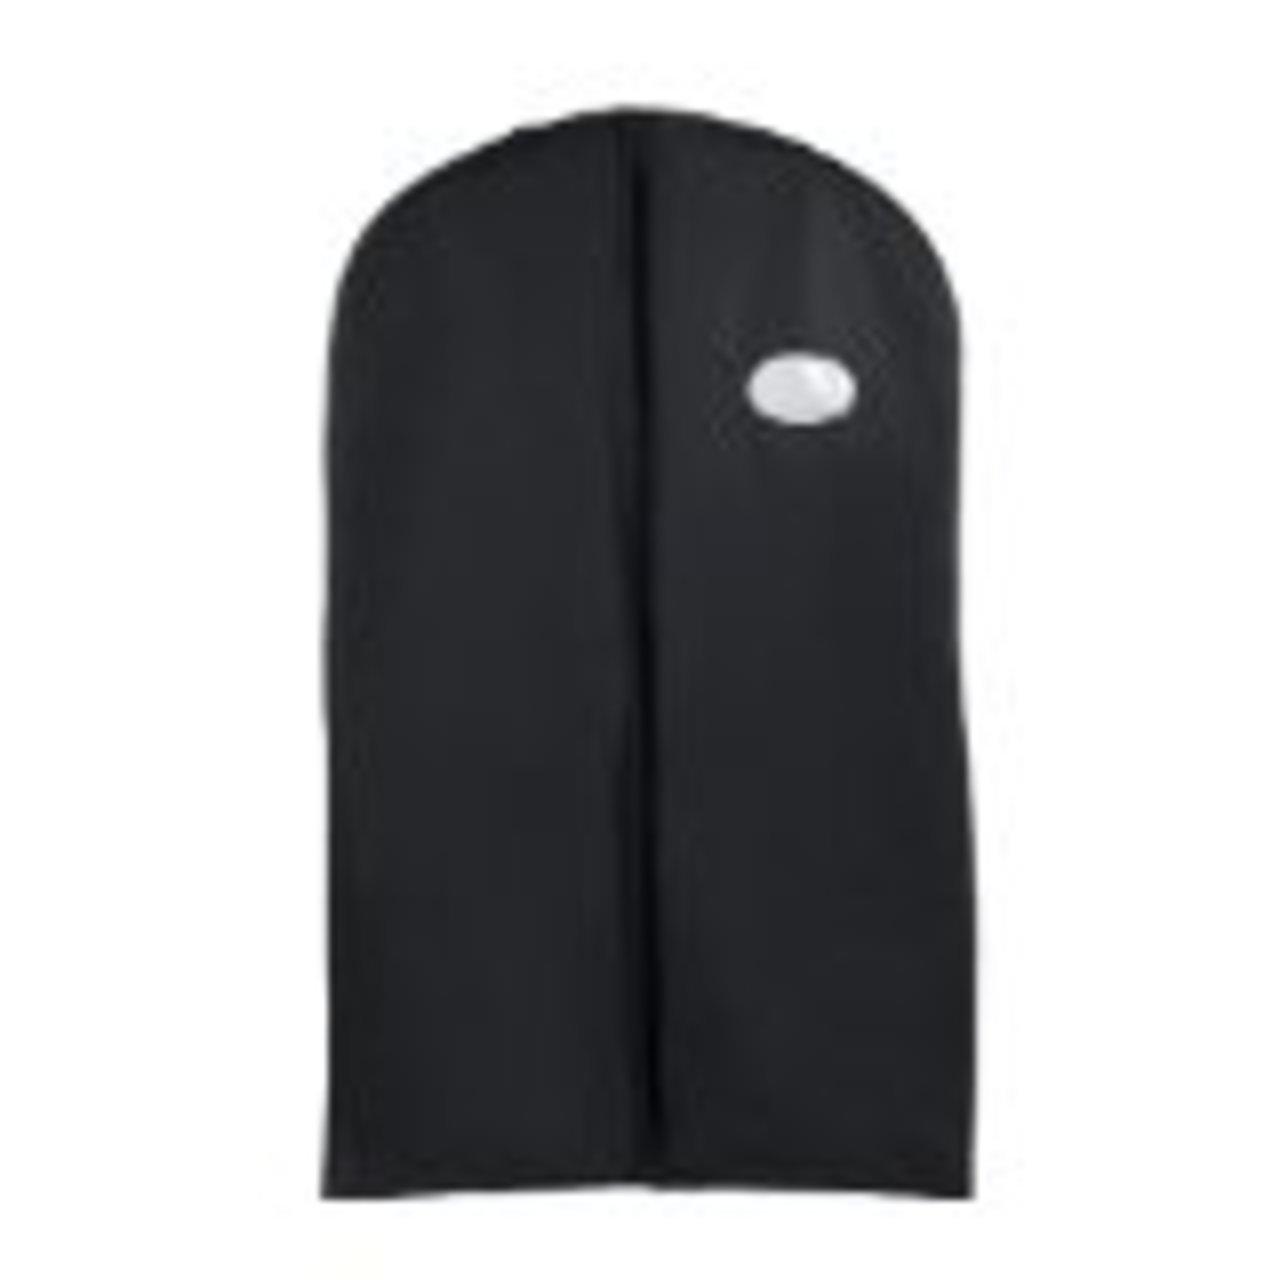 Dance Garment bag, Black Vinyl costume/uniform/dress Zipper Travel Garment Bag, 40'' By Tuva Inc.